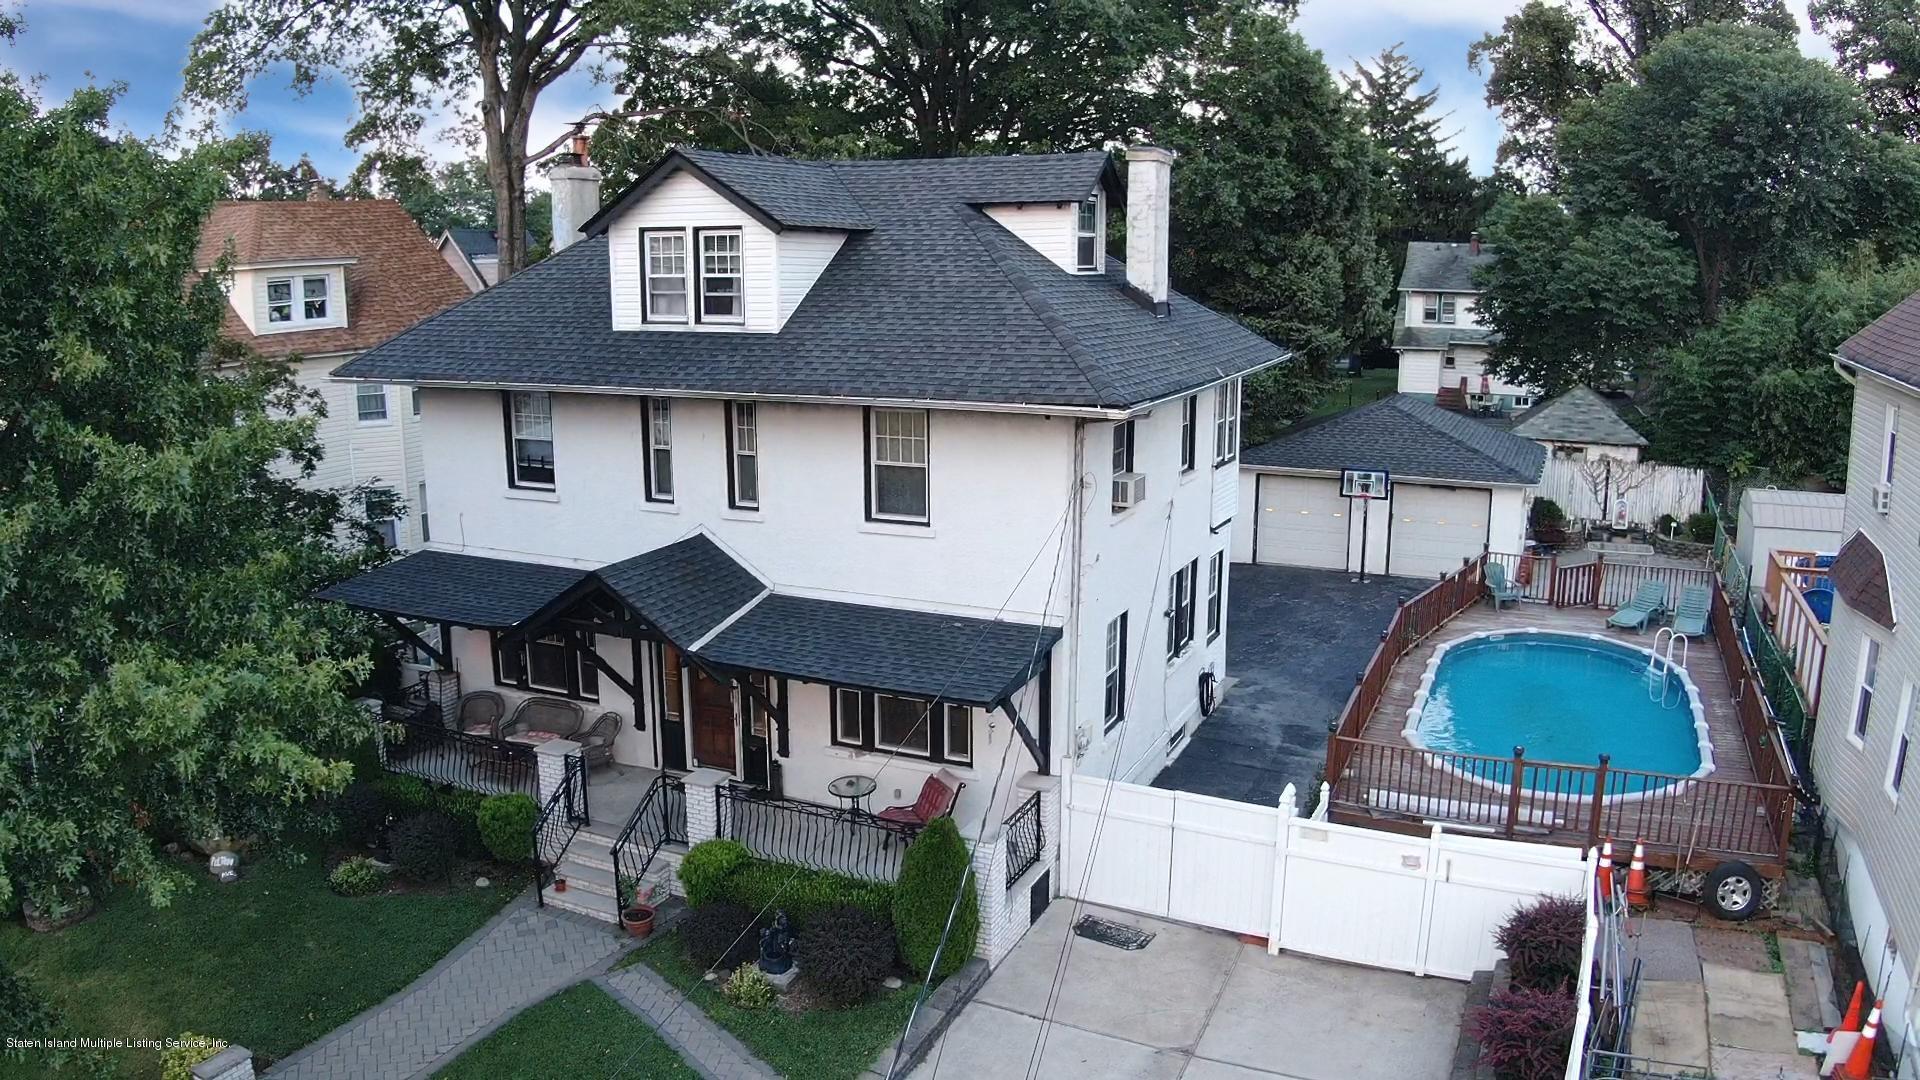 Single Family - Detached 31 Pelton Avenue  Staten Island, NY 10310, MLS-1132177-28